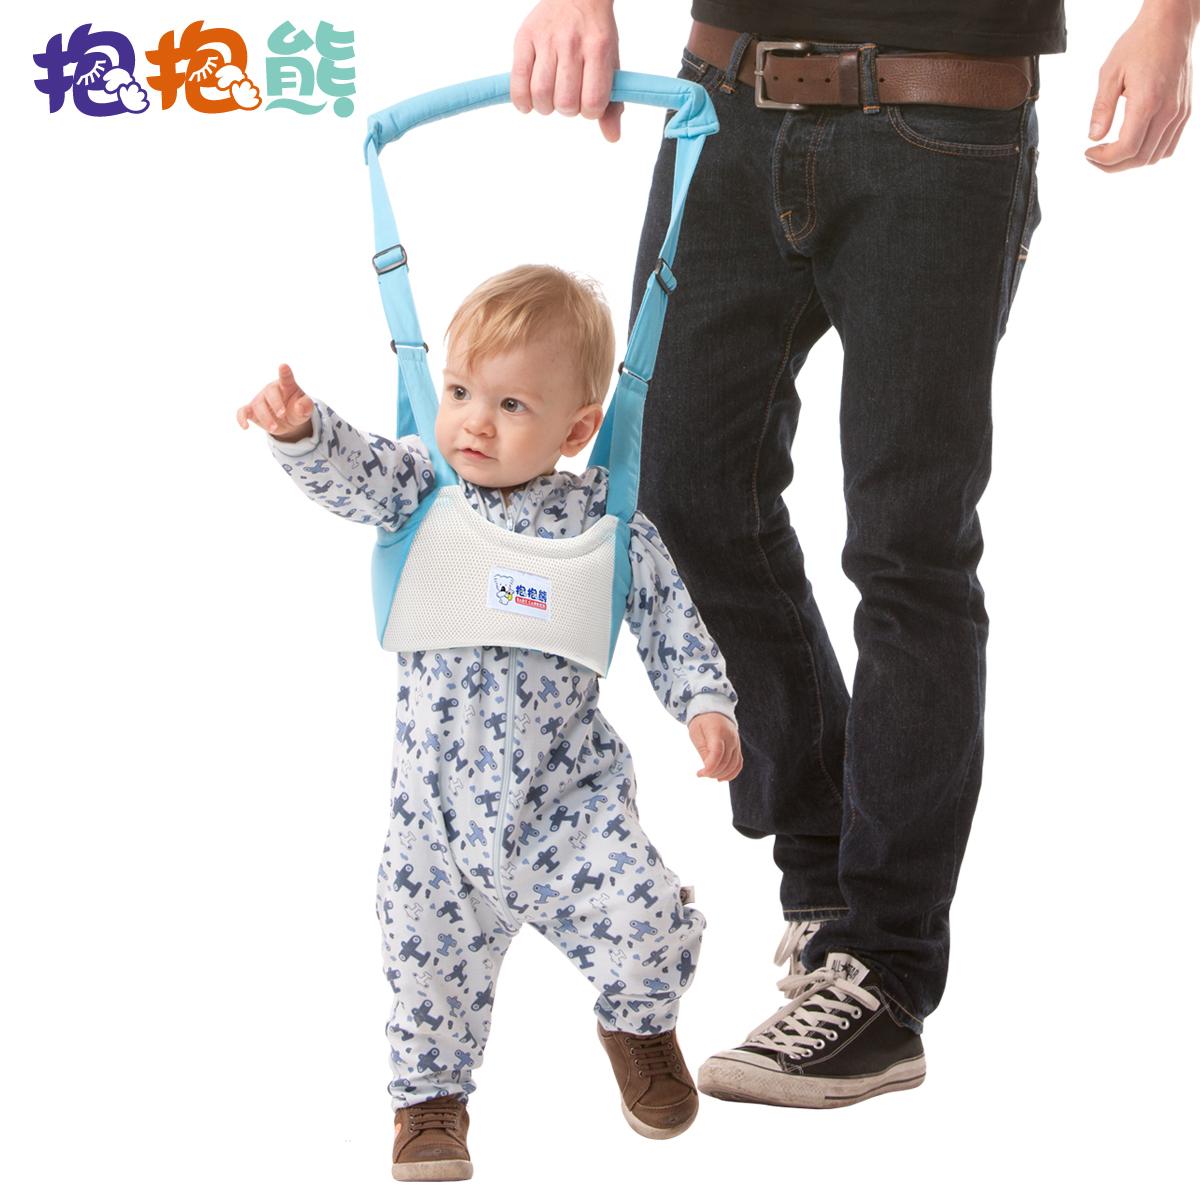 Поводья для ребенка фото